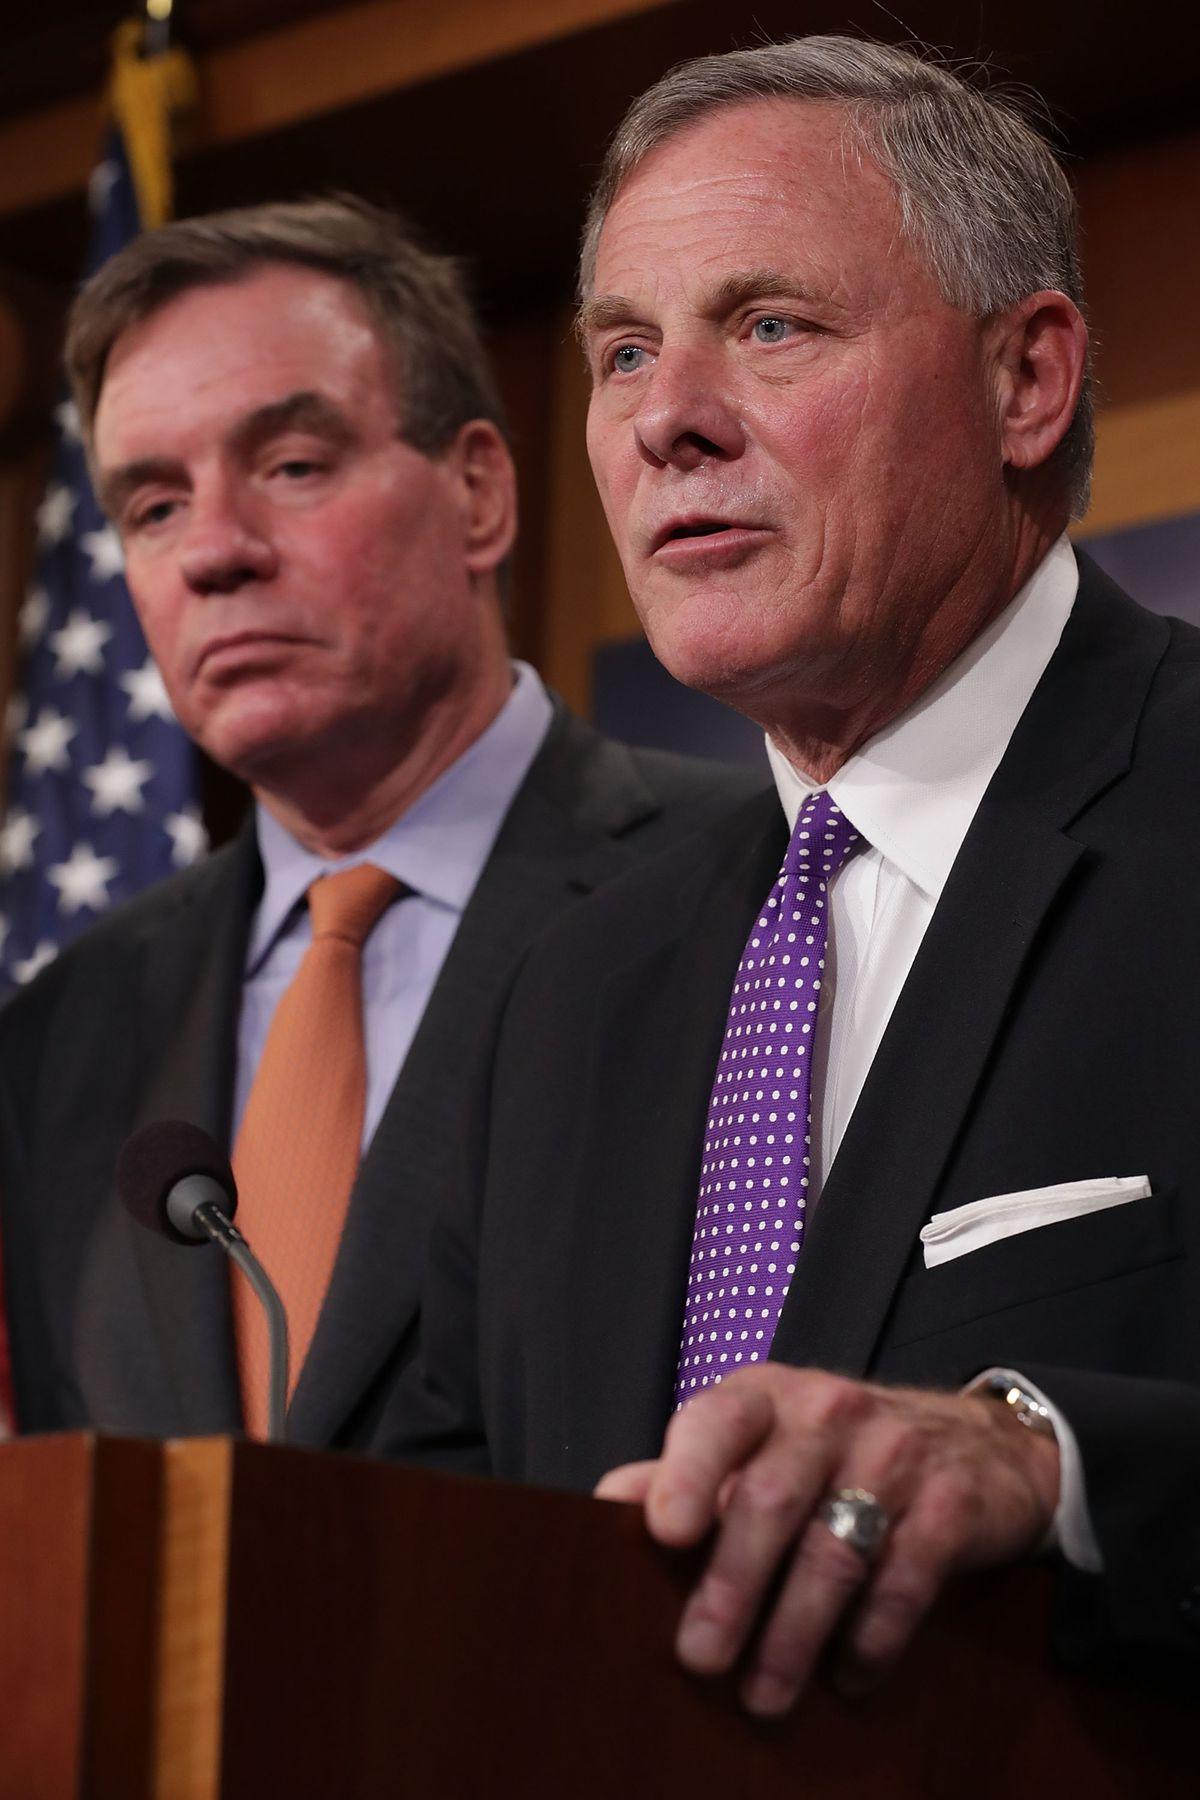 Senate Intelligence Committee Leaders Brief The Media On Russia Investigation